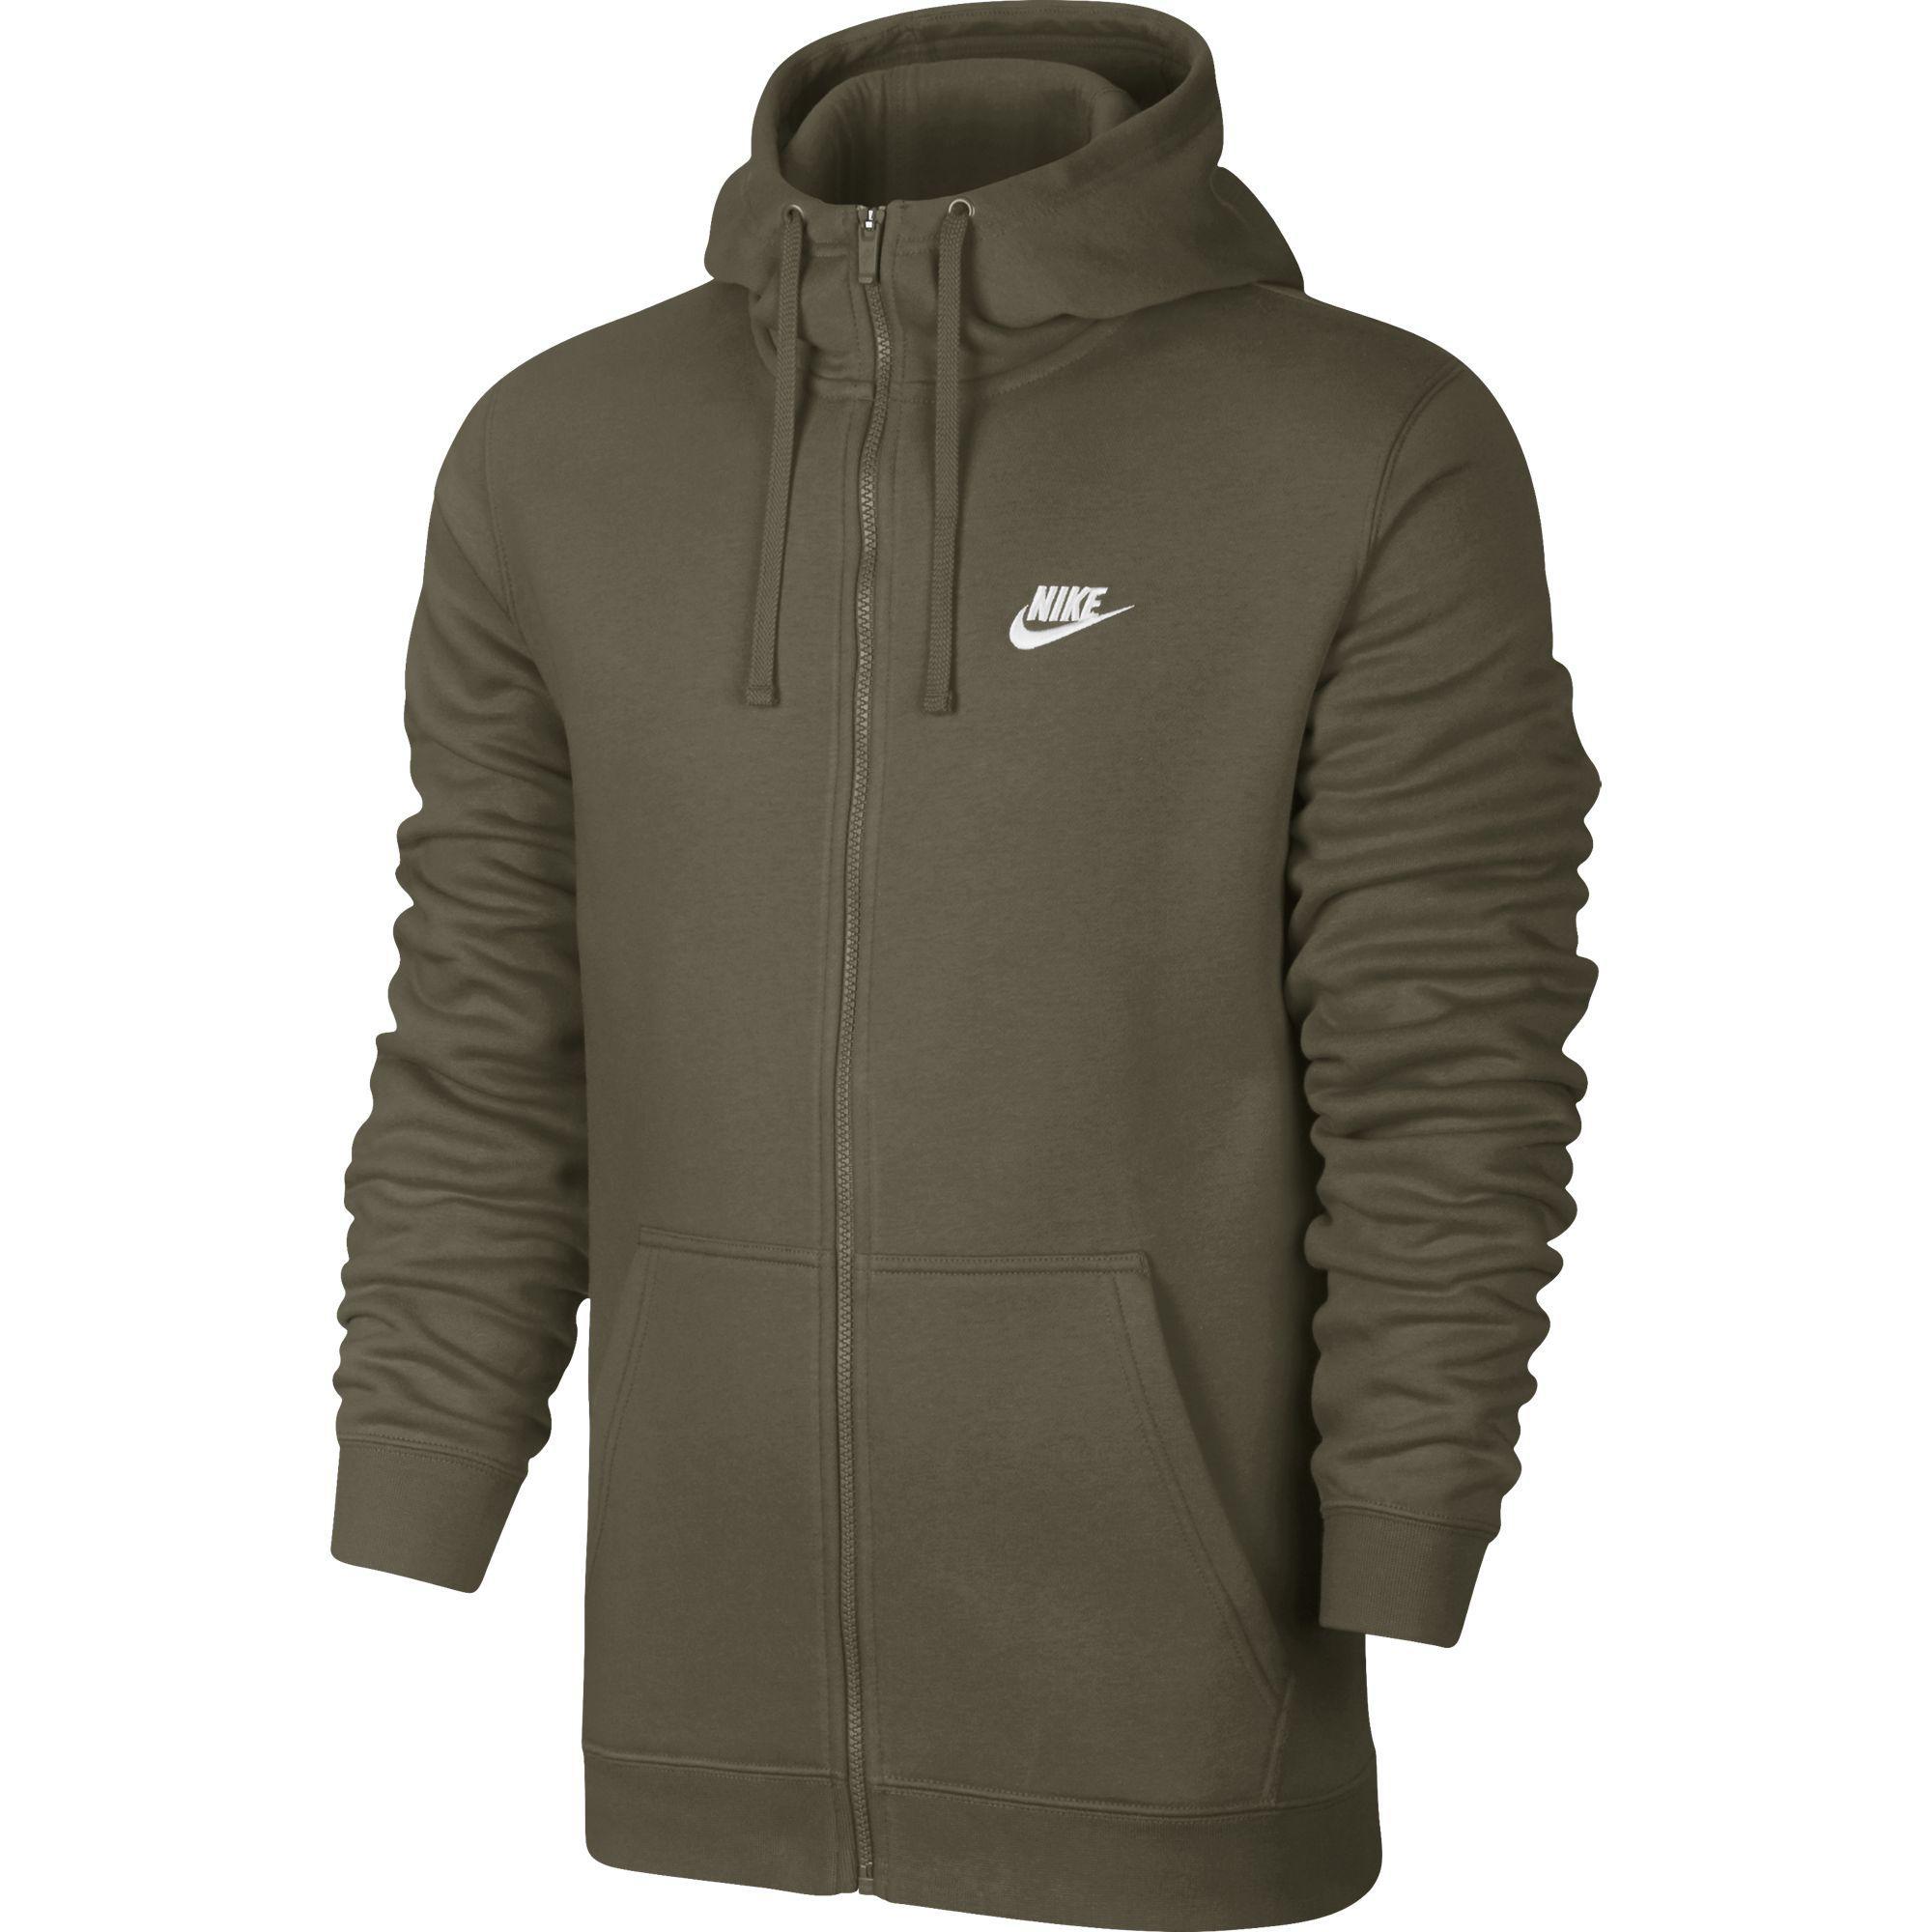 2a3bce470b0e Nike Mens Sportswear Full-Zip Hoodie - Medium Olive - Tennisnuts.com